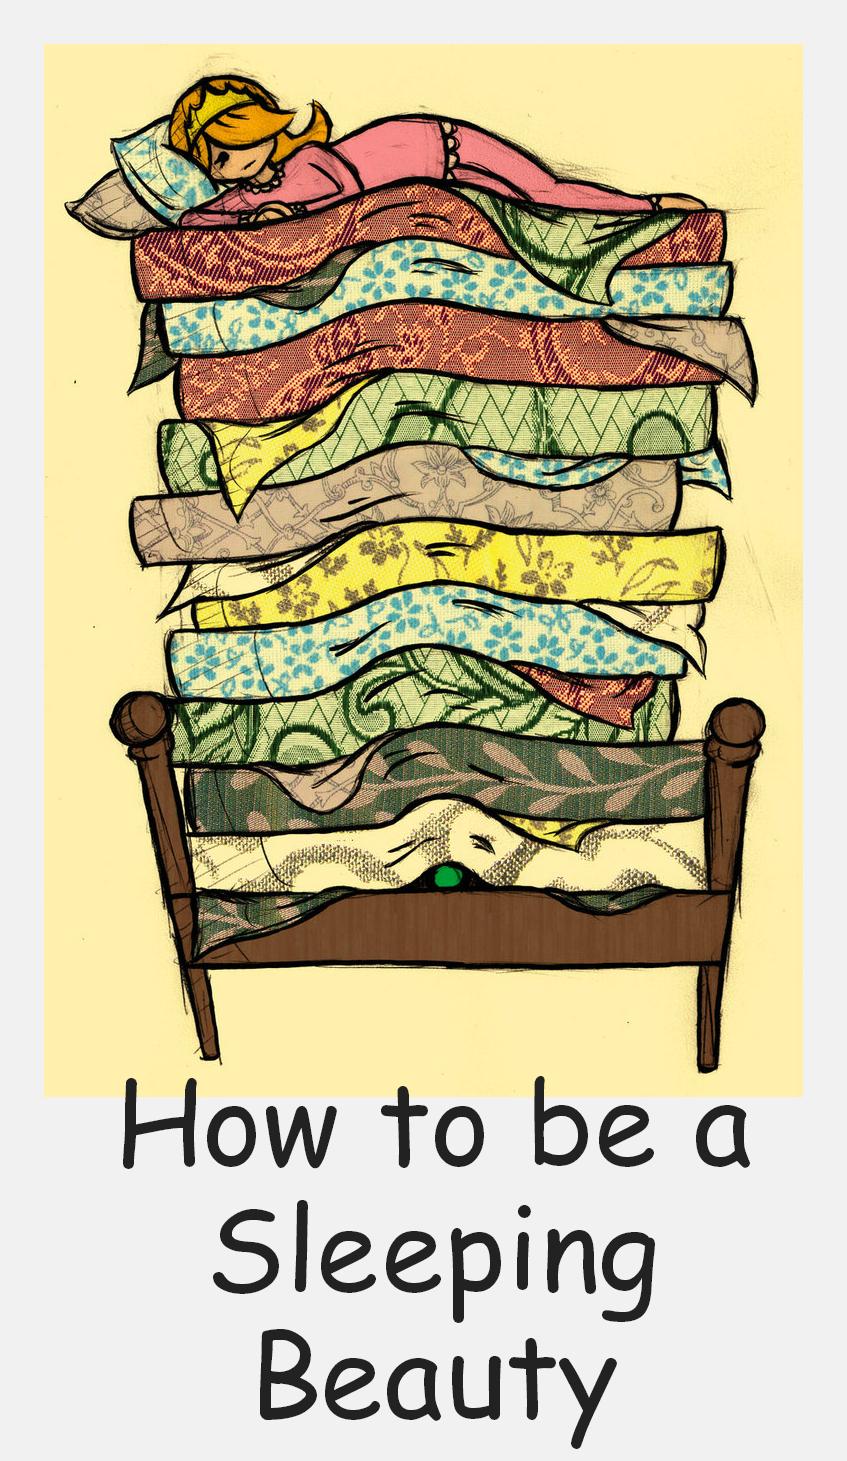 sleeping beauty tips, overnight beauty tips